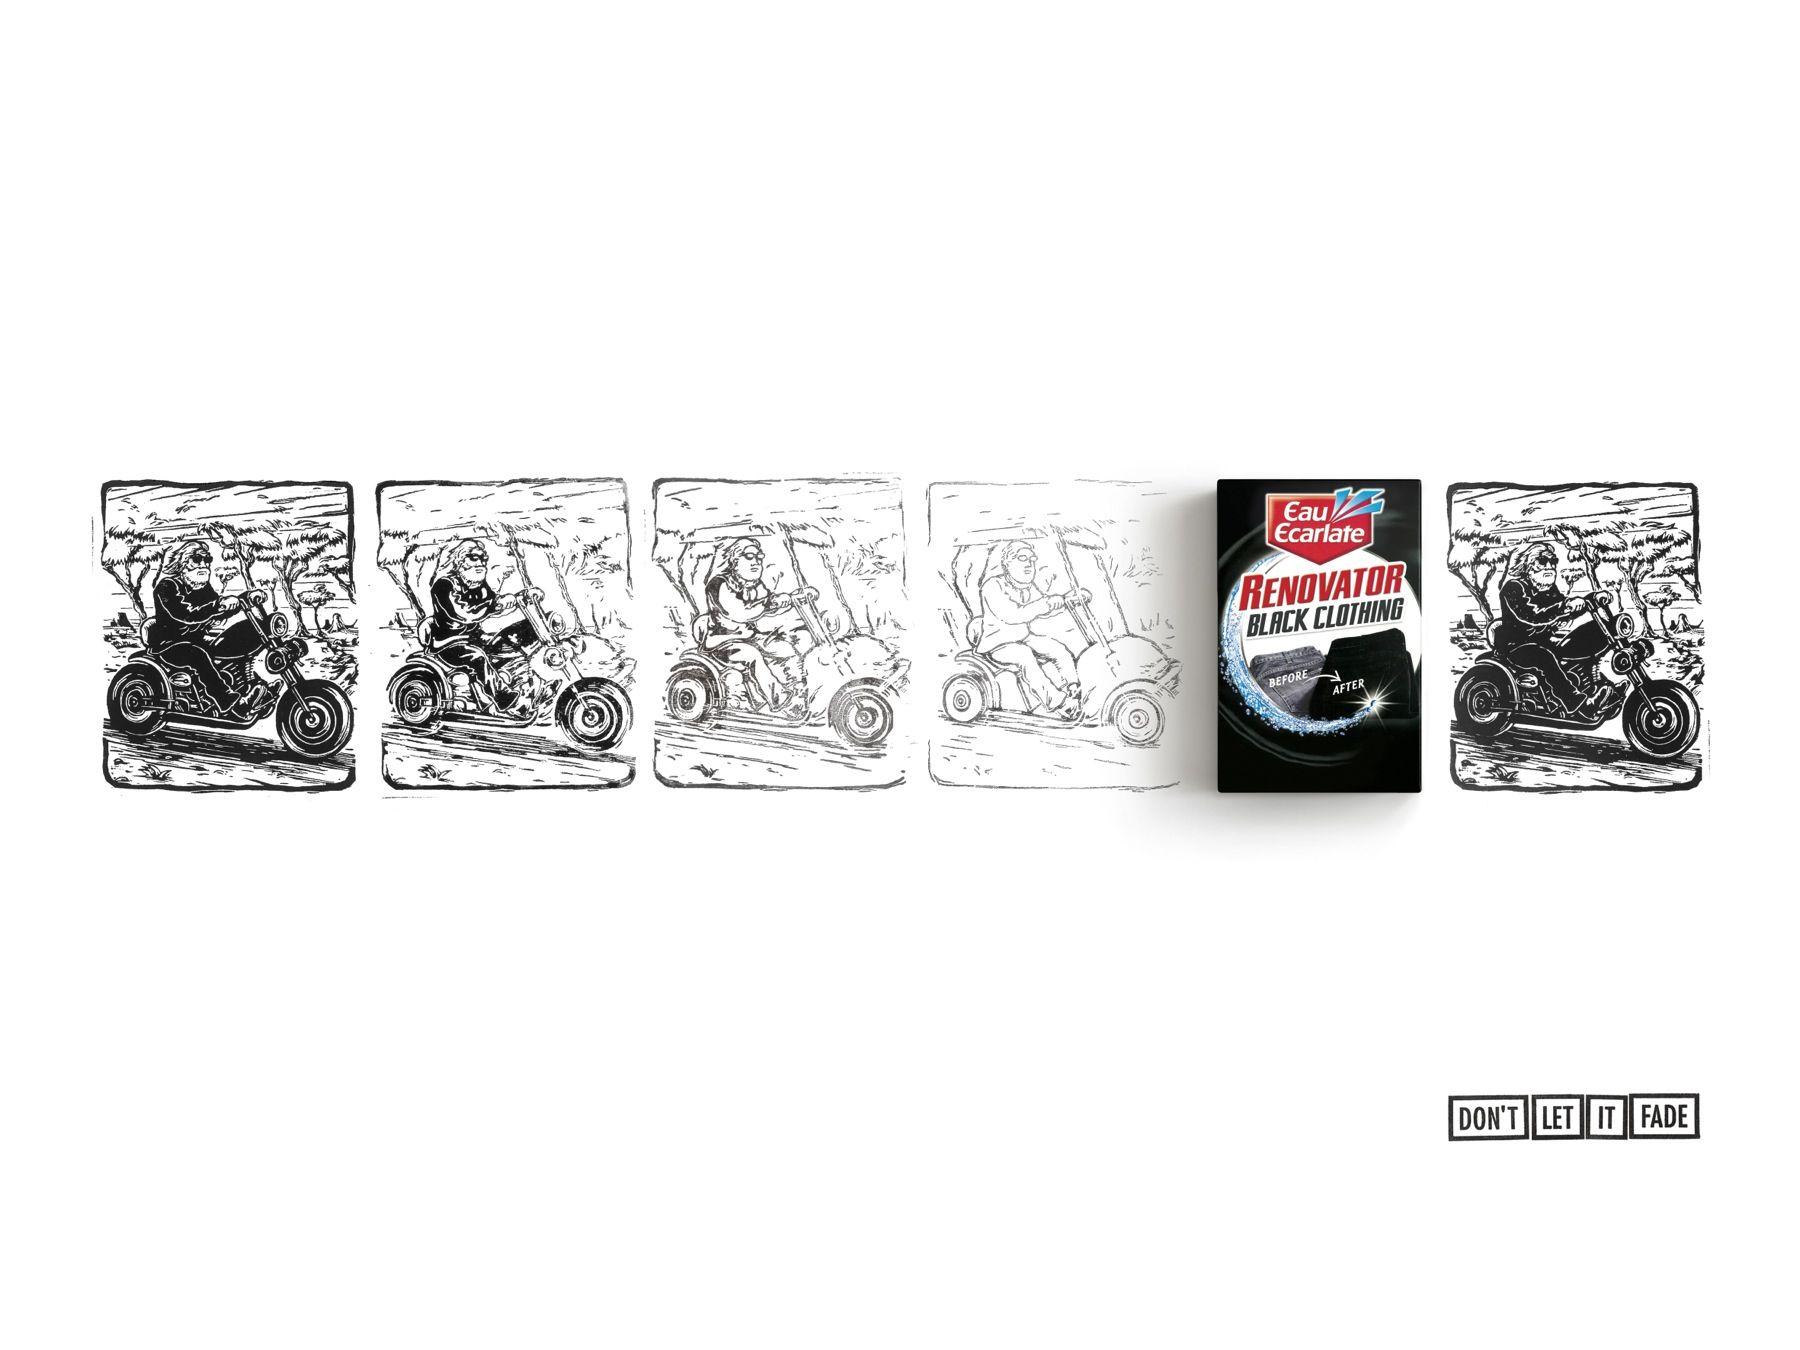 Eau Ecarlate Renovator Black Clothing: Biker  Don't let it fade. Advertising Agency: Herezie, Paris, France